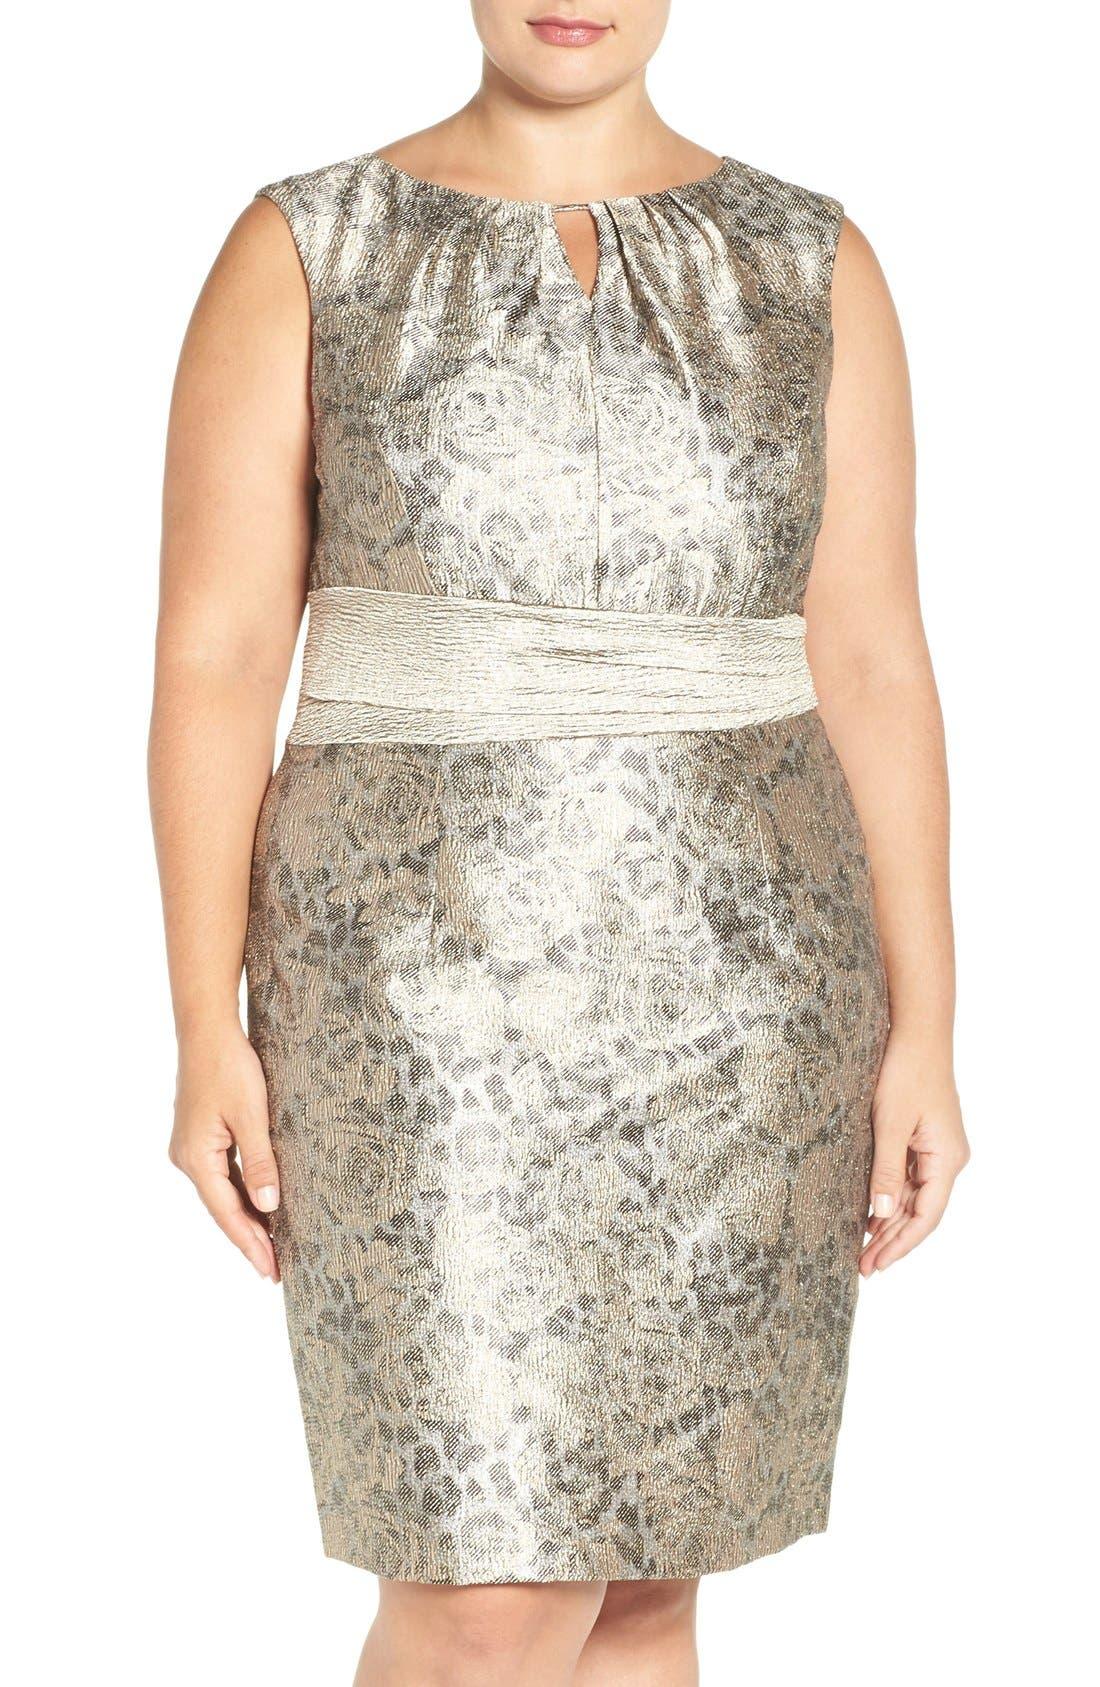 ELLEN TRACY Metallic Jacquard Sheath Dress